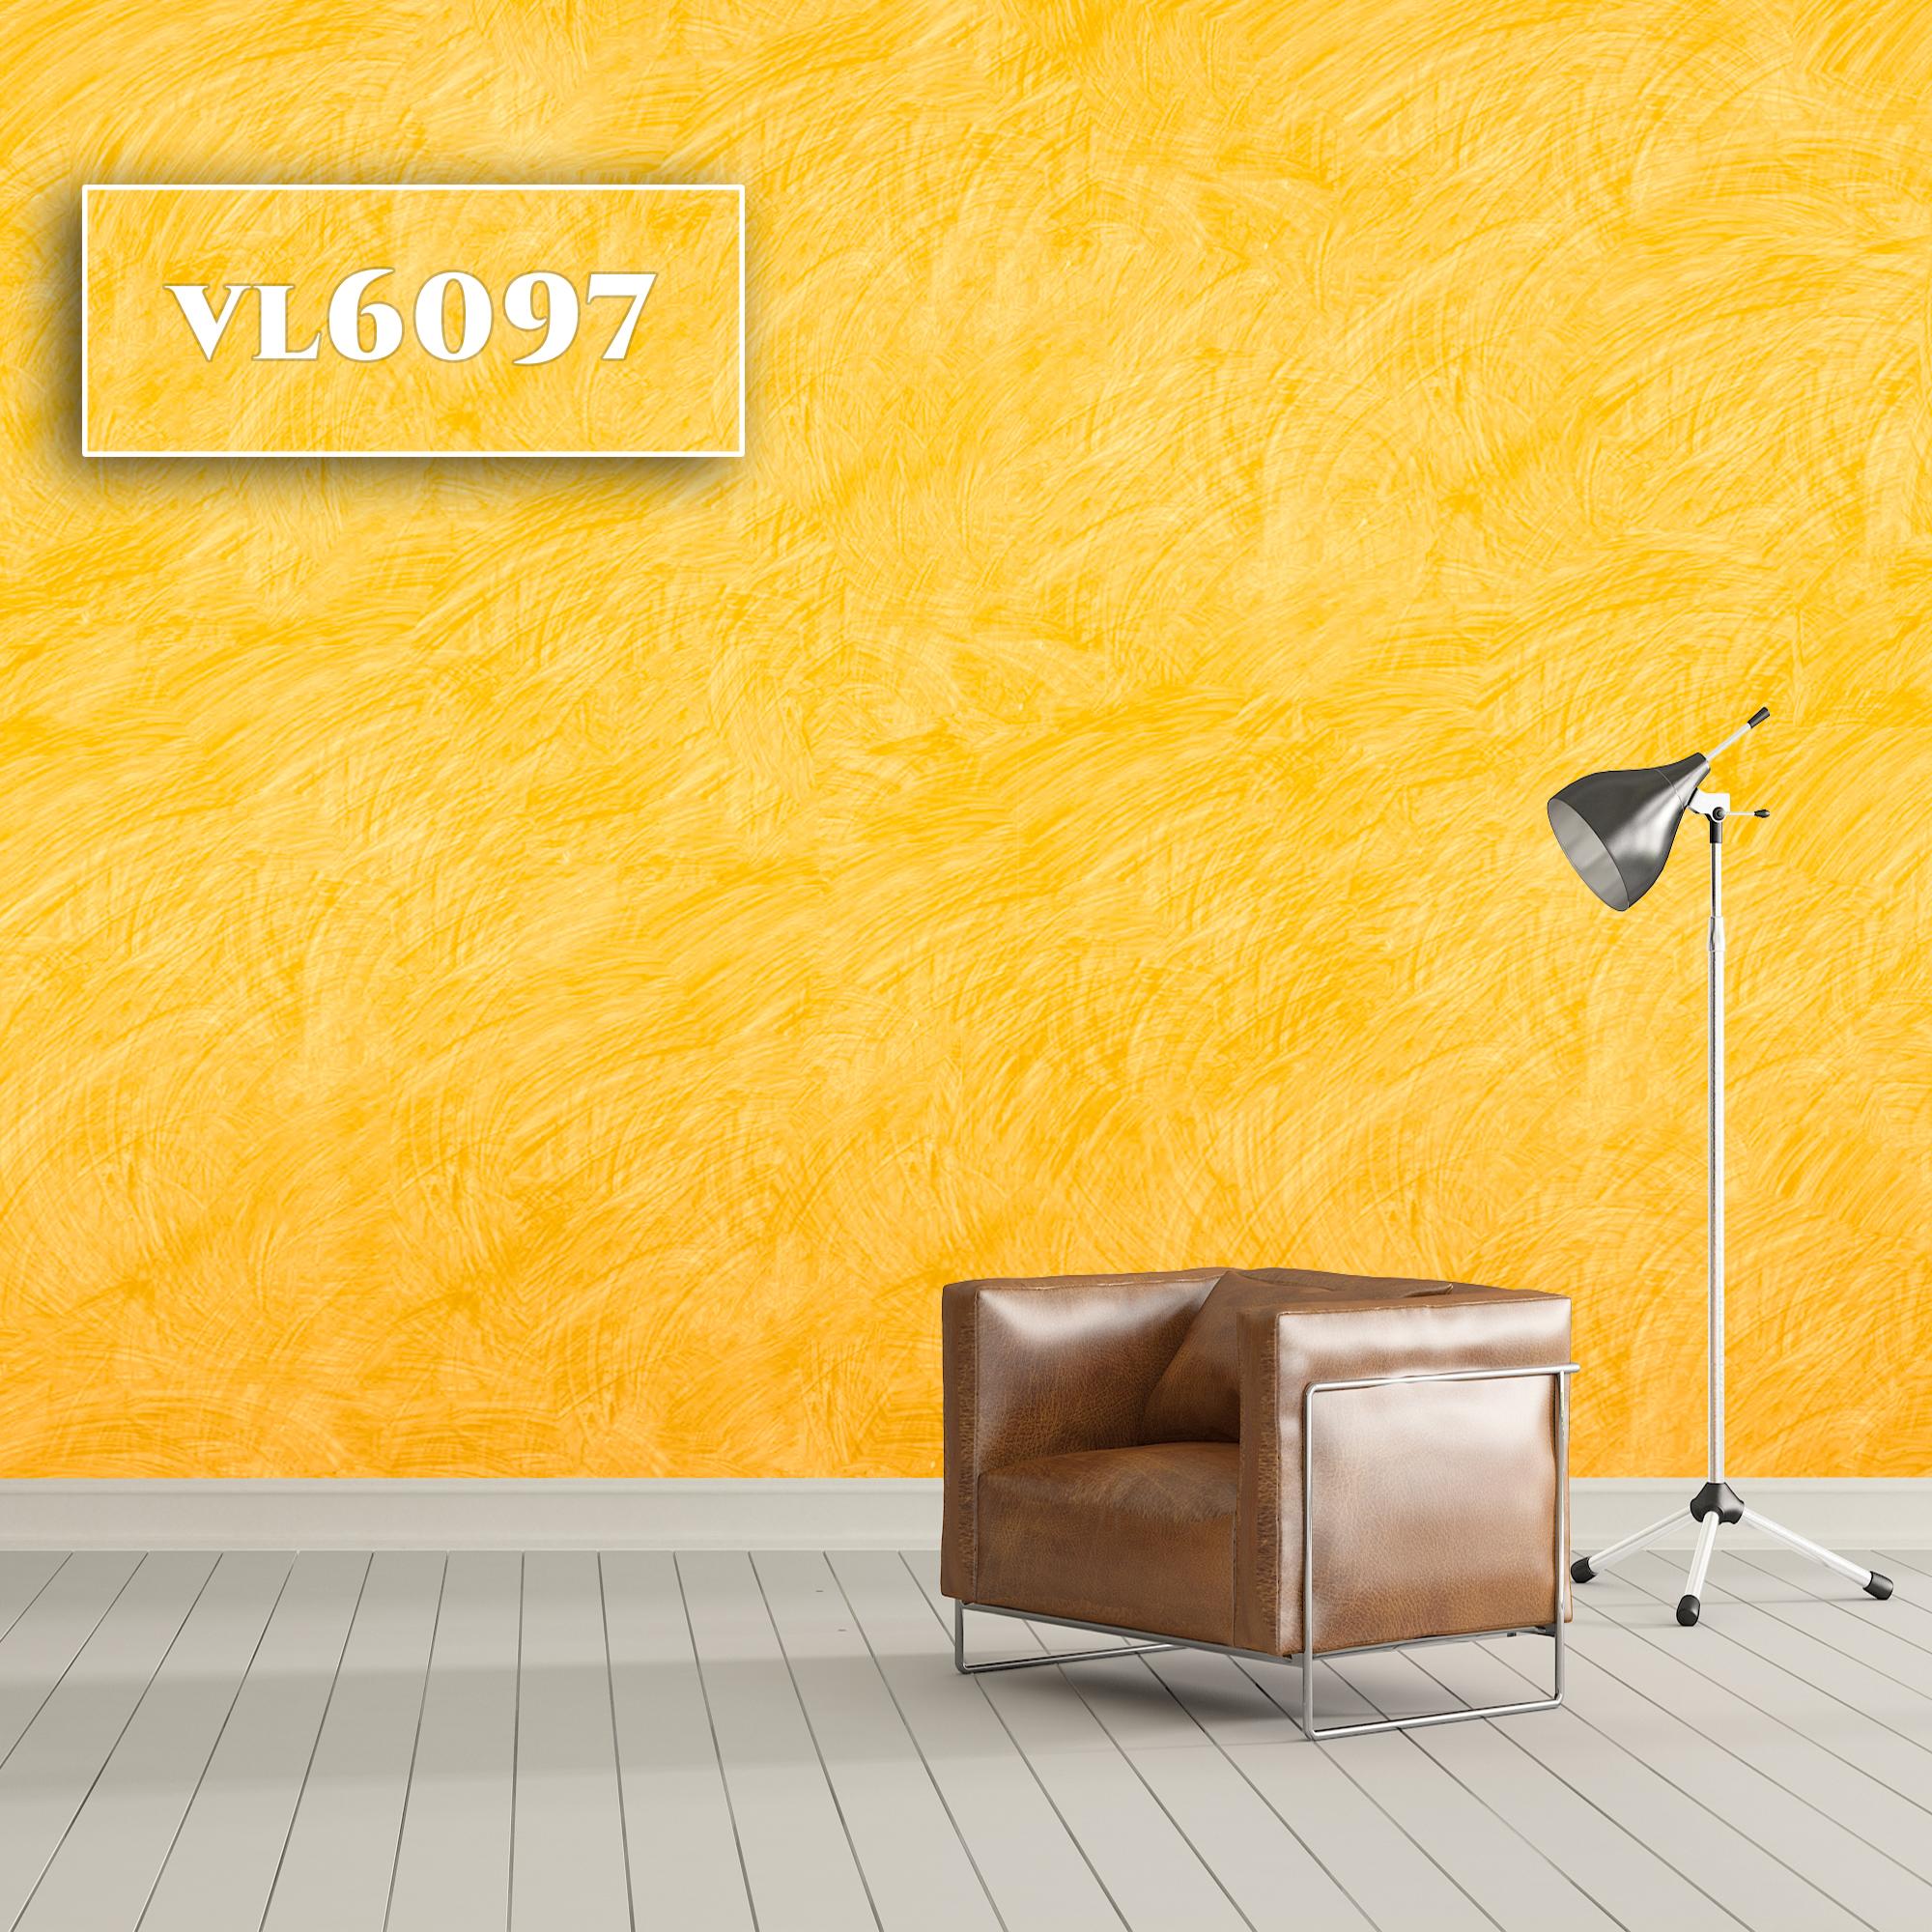 VL6097